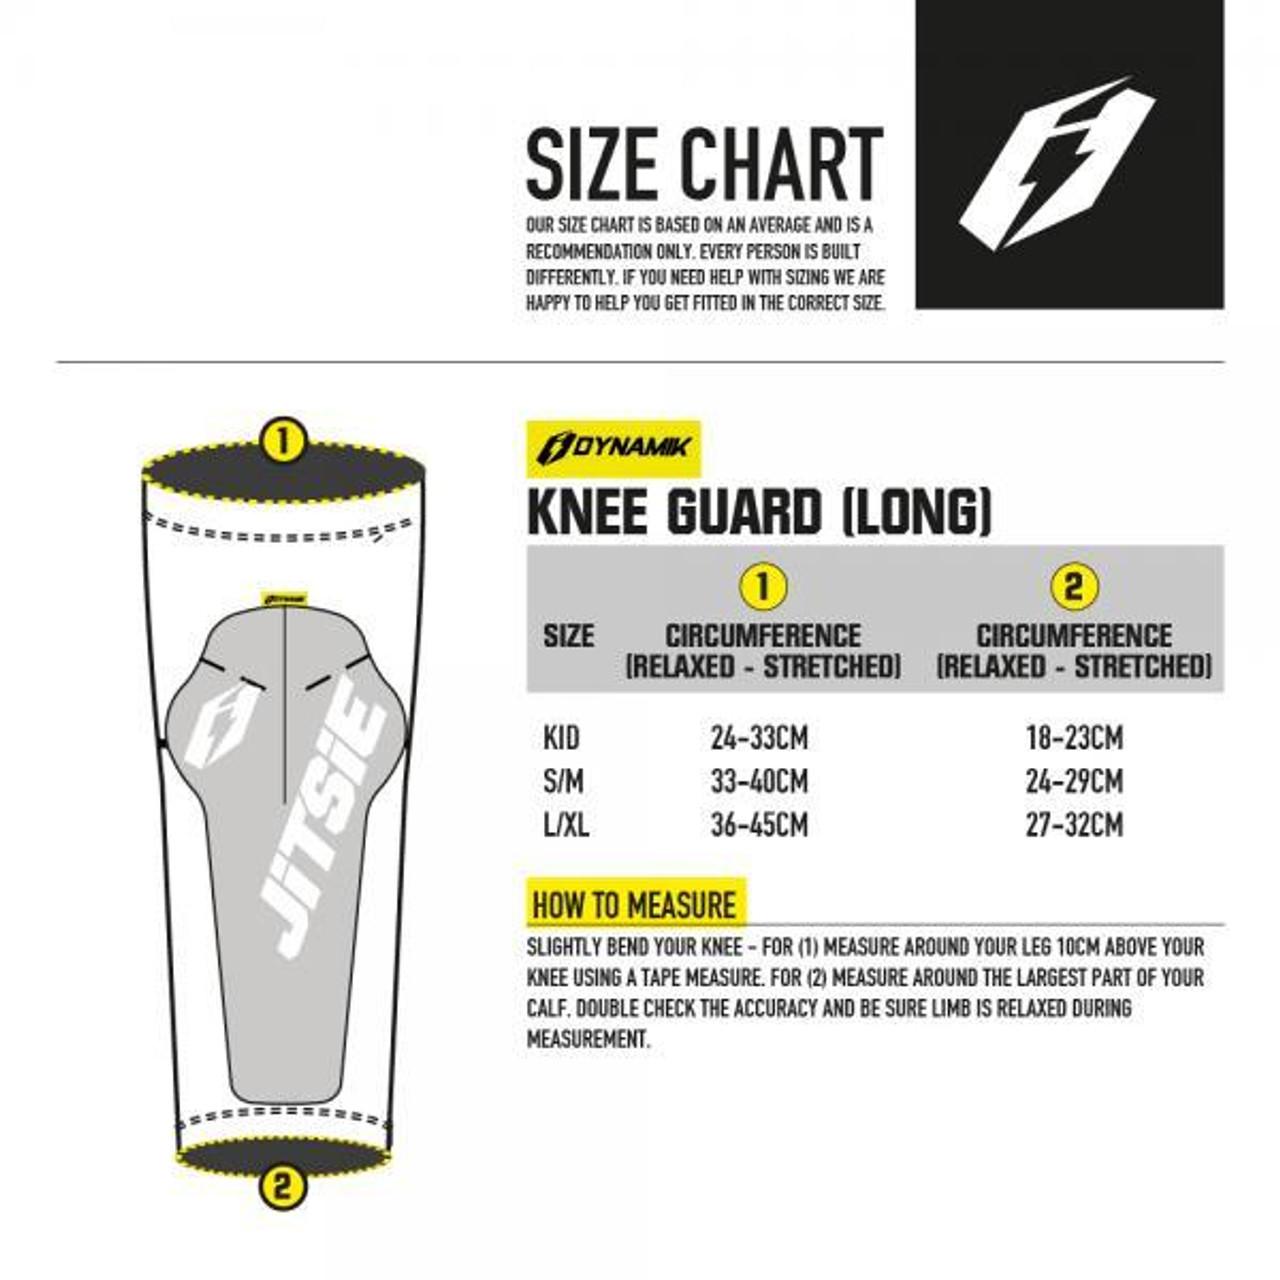 Knee guards Dynamik